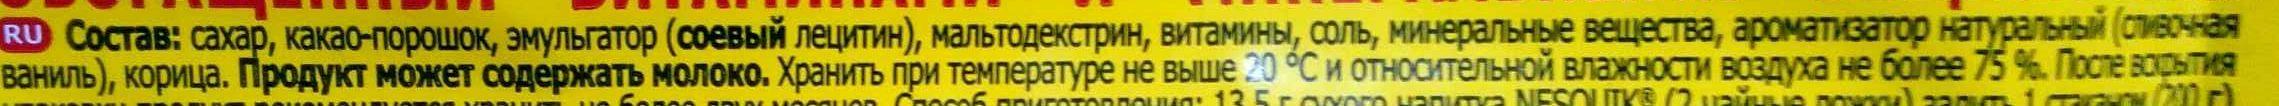 Nesquik®. Opti-start®. - Ingrédients - ru